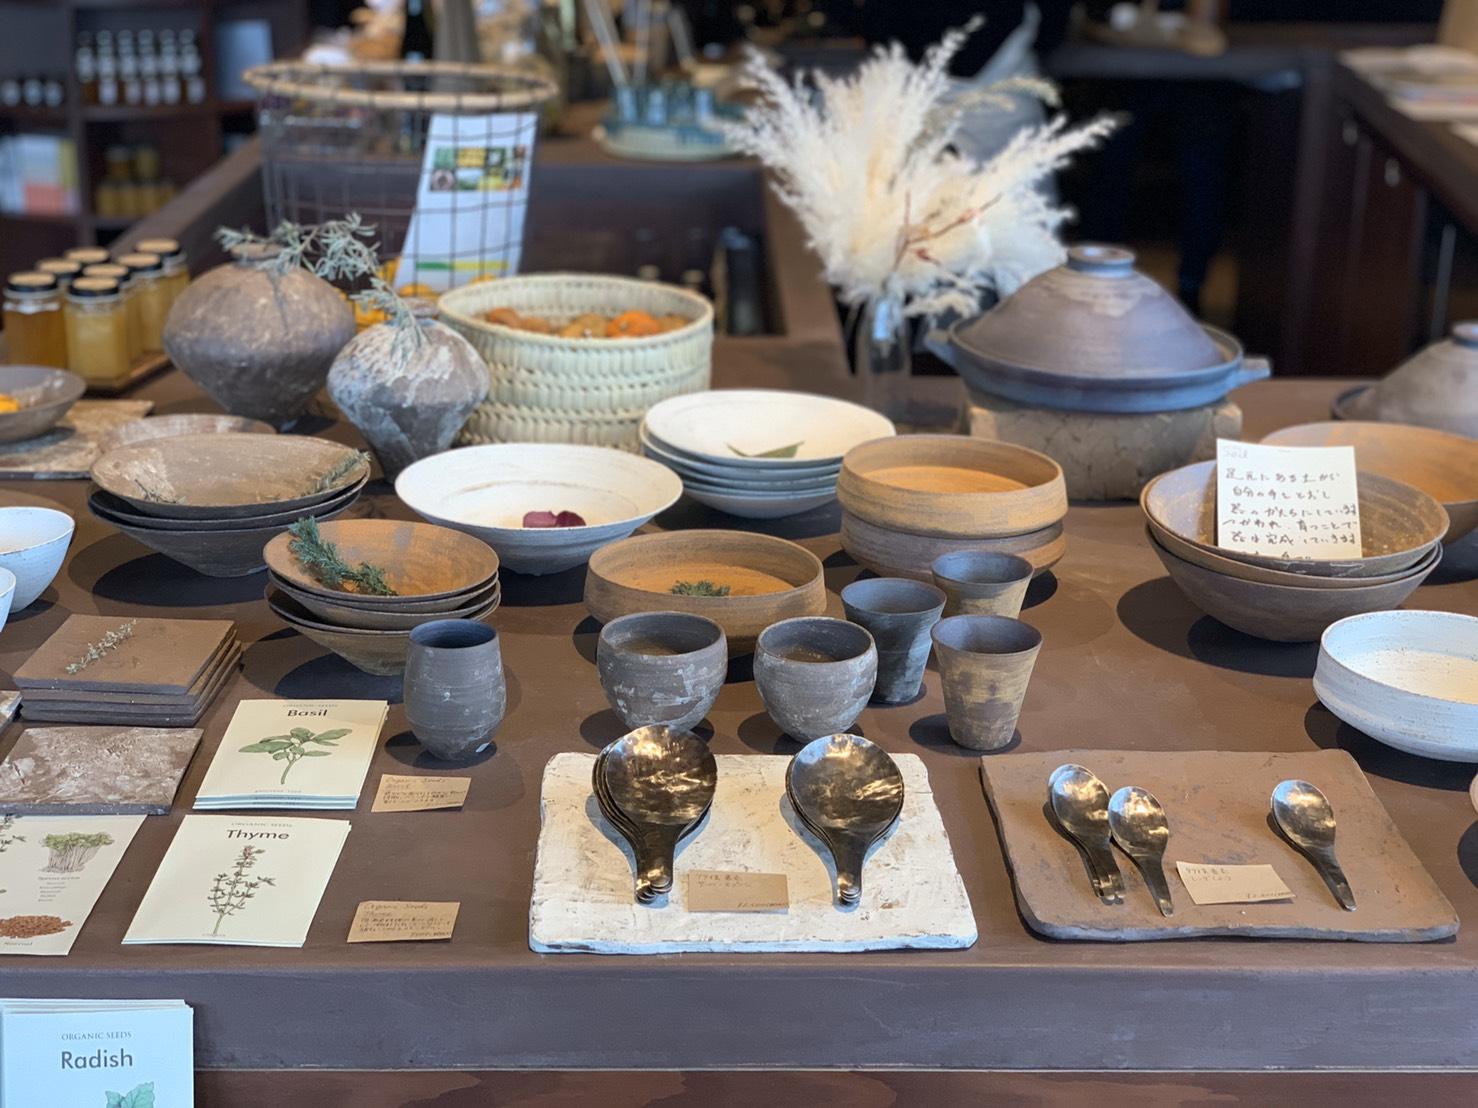 Eatrip soil販售野村友里女士來自日本各地的選物